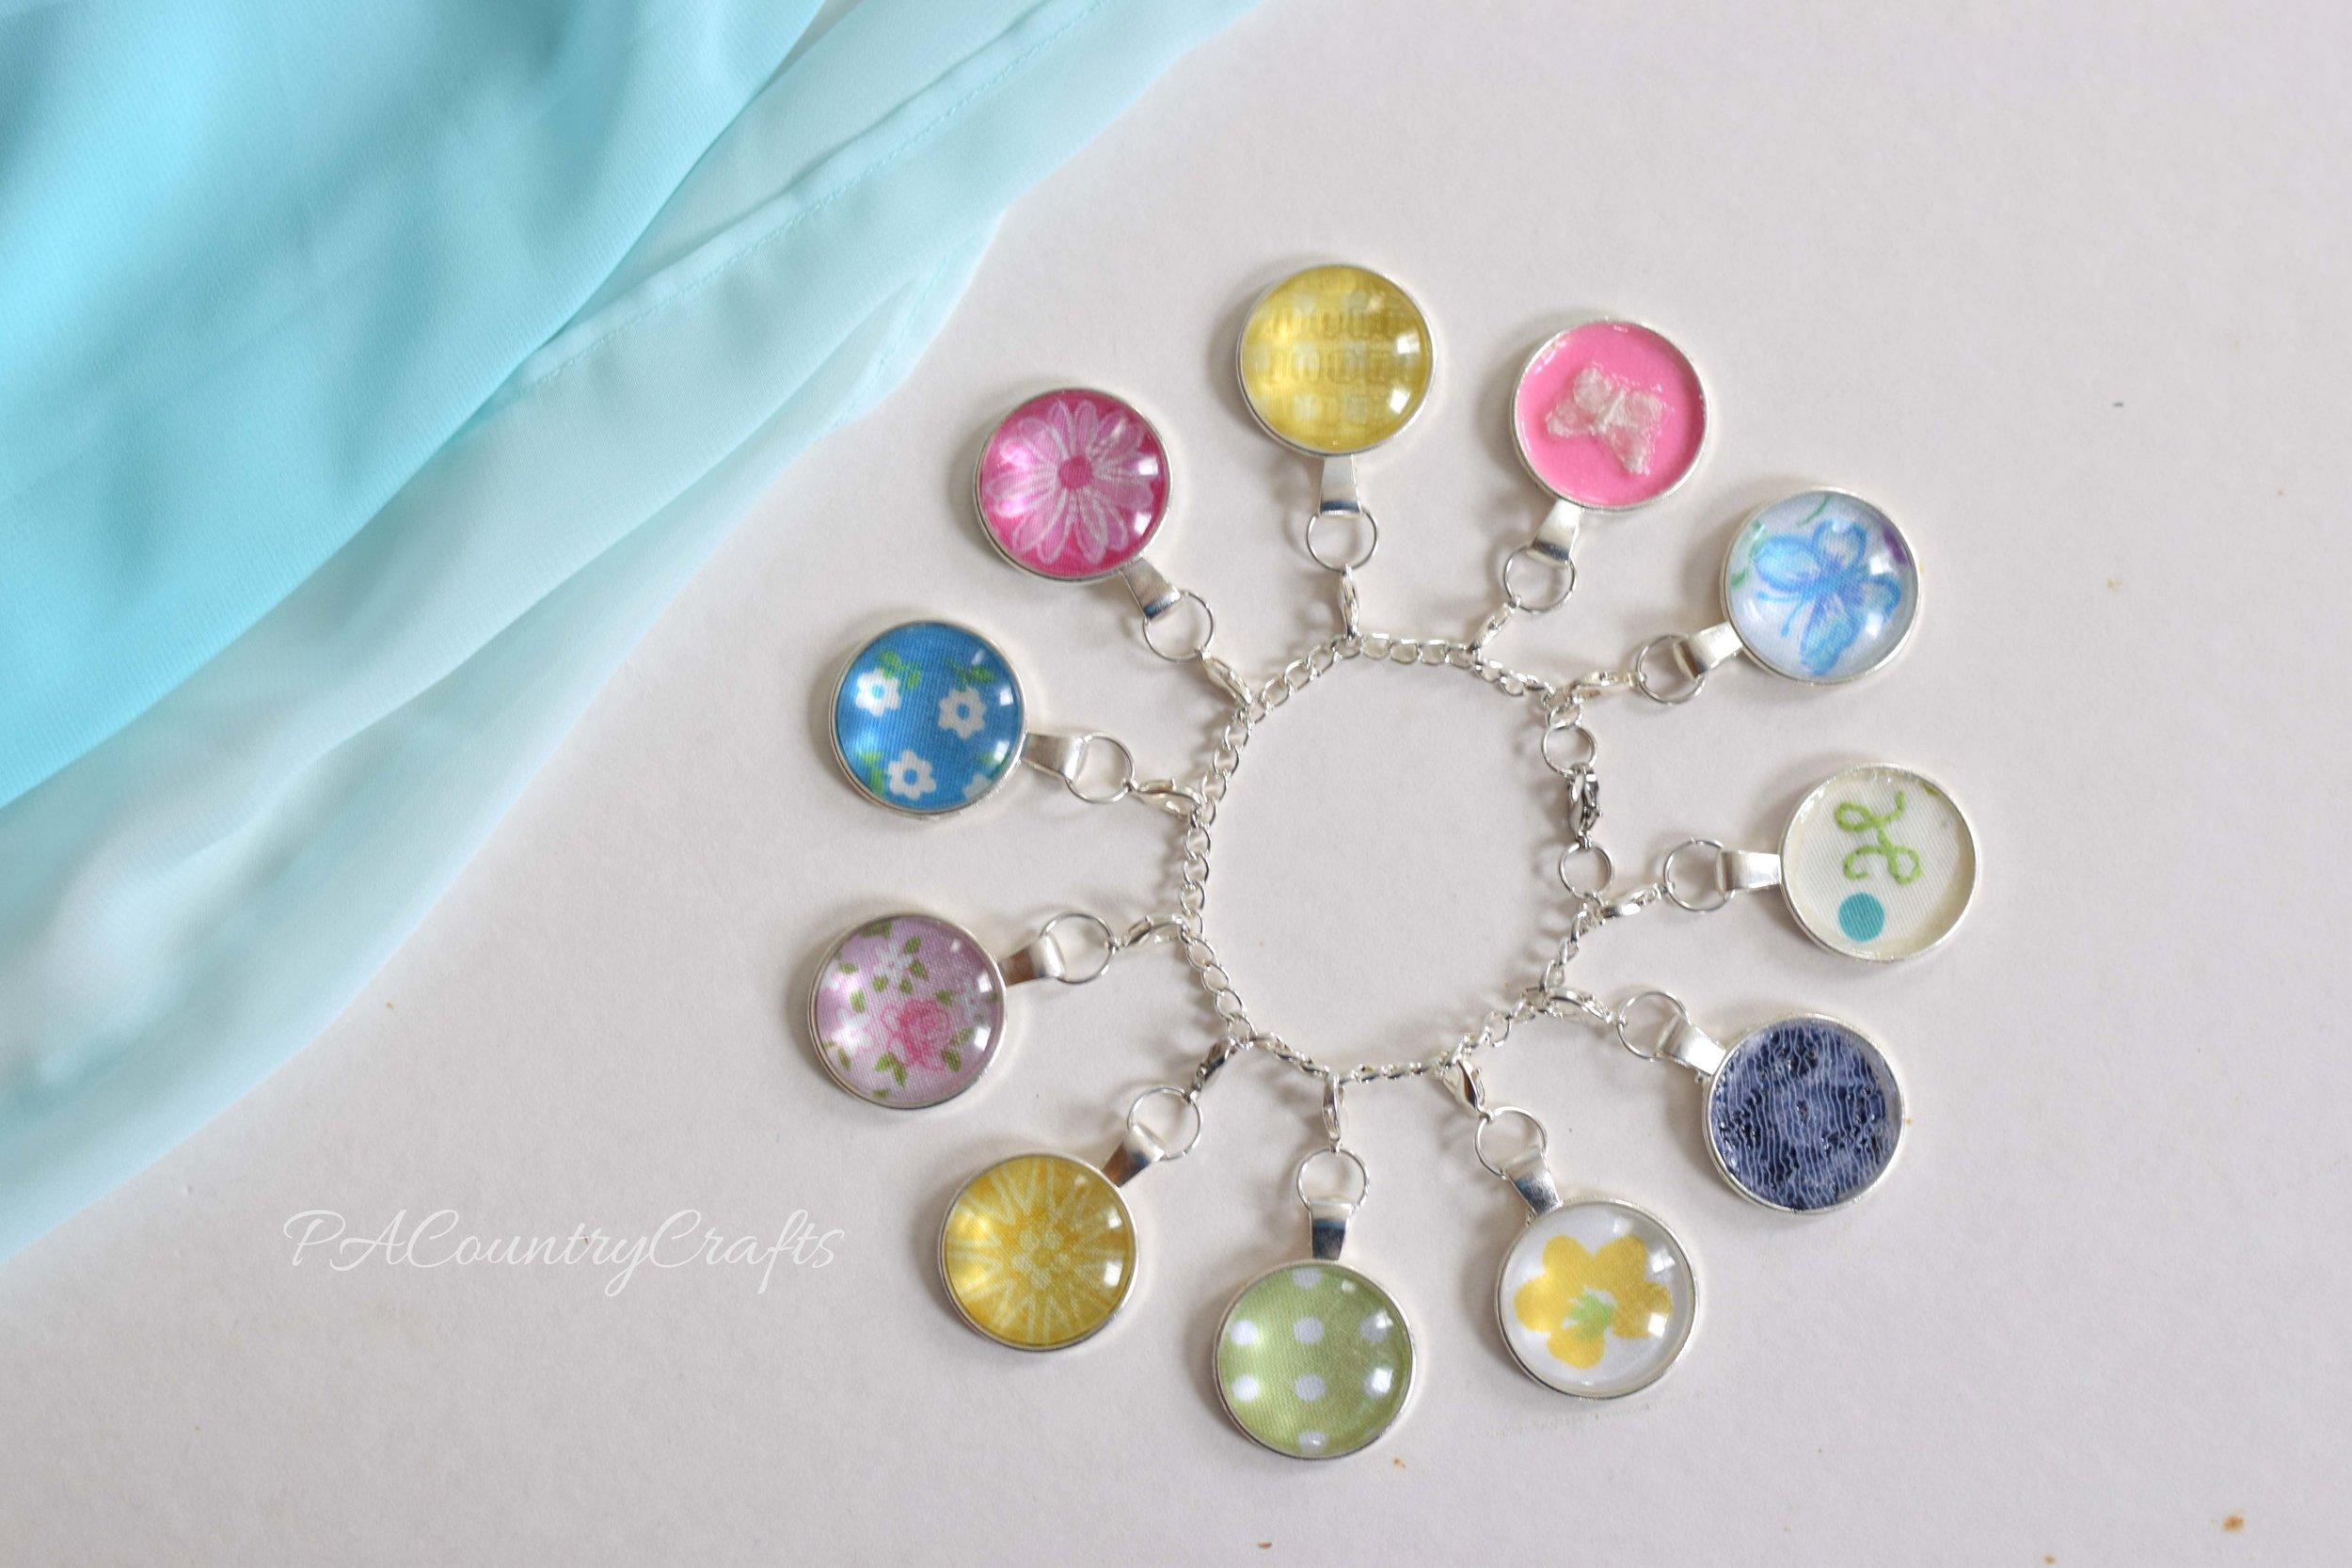 fabric scrap charm bracelet